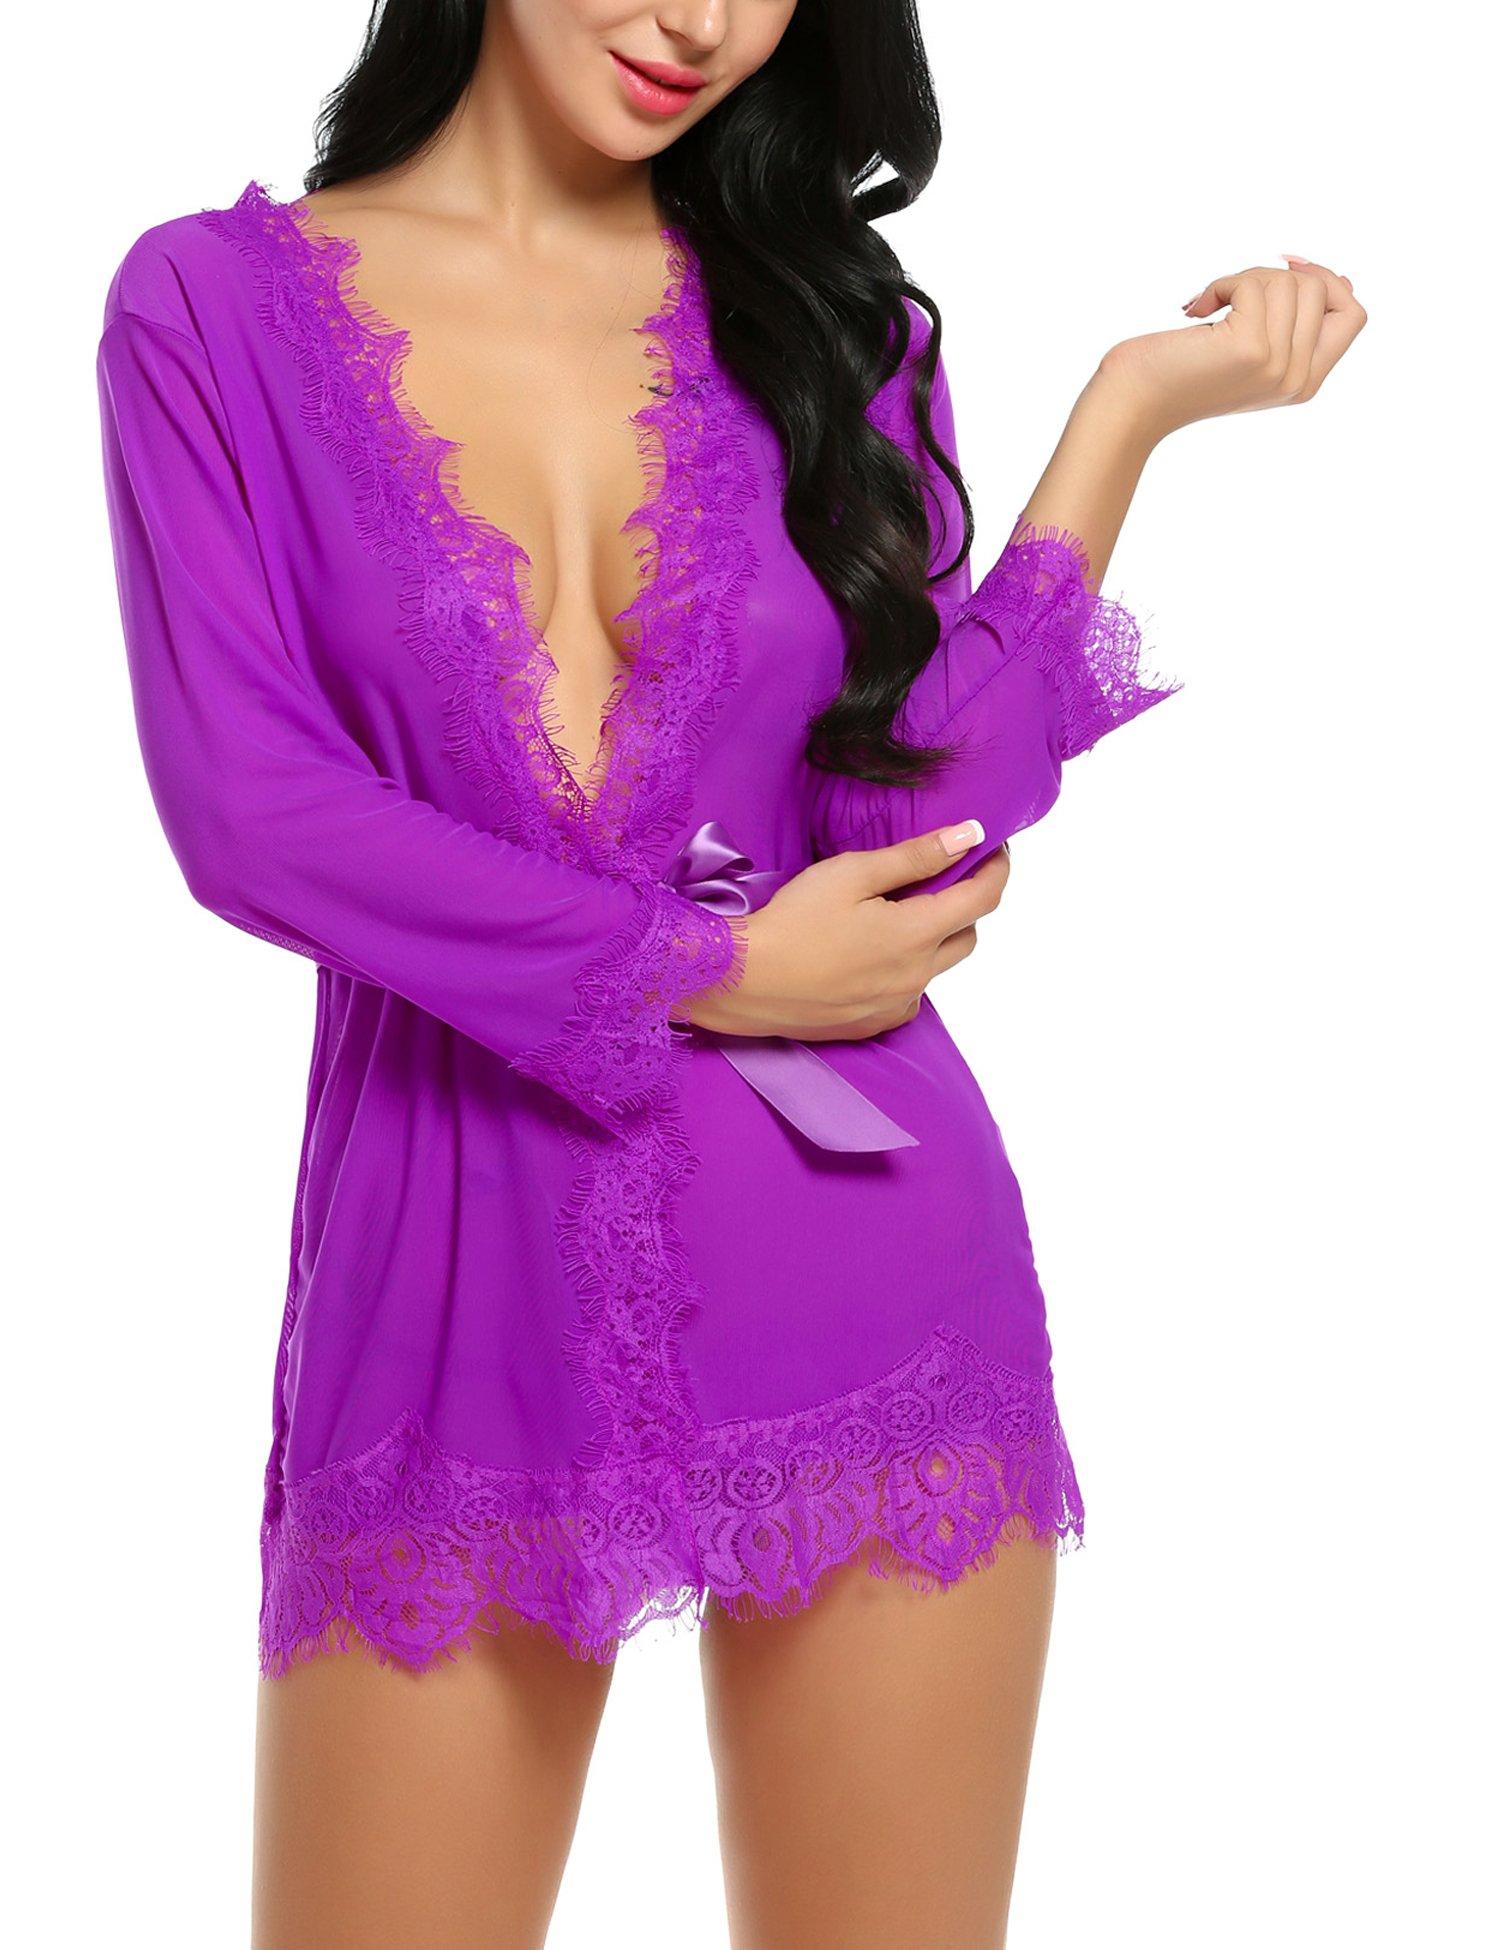 Avidlove Women's Lace Kimono Robe Mesh Babydoll Lingerie Chemise Purple S by Avidlove (Image #3)